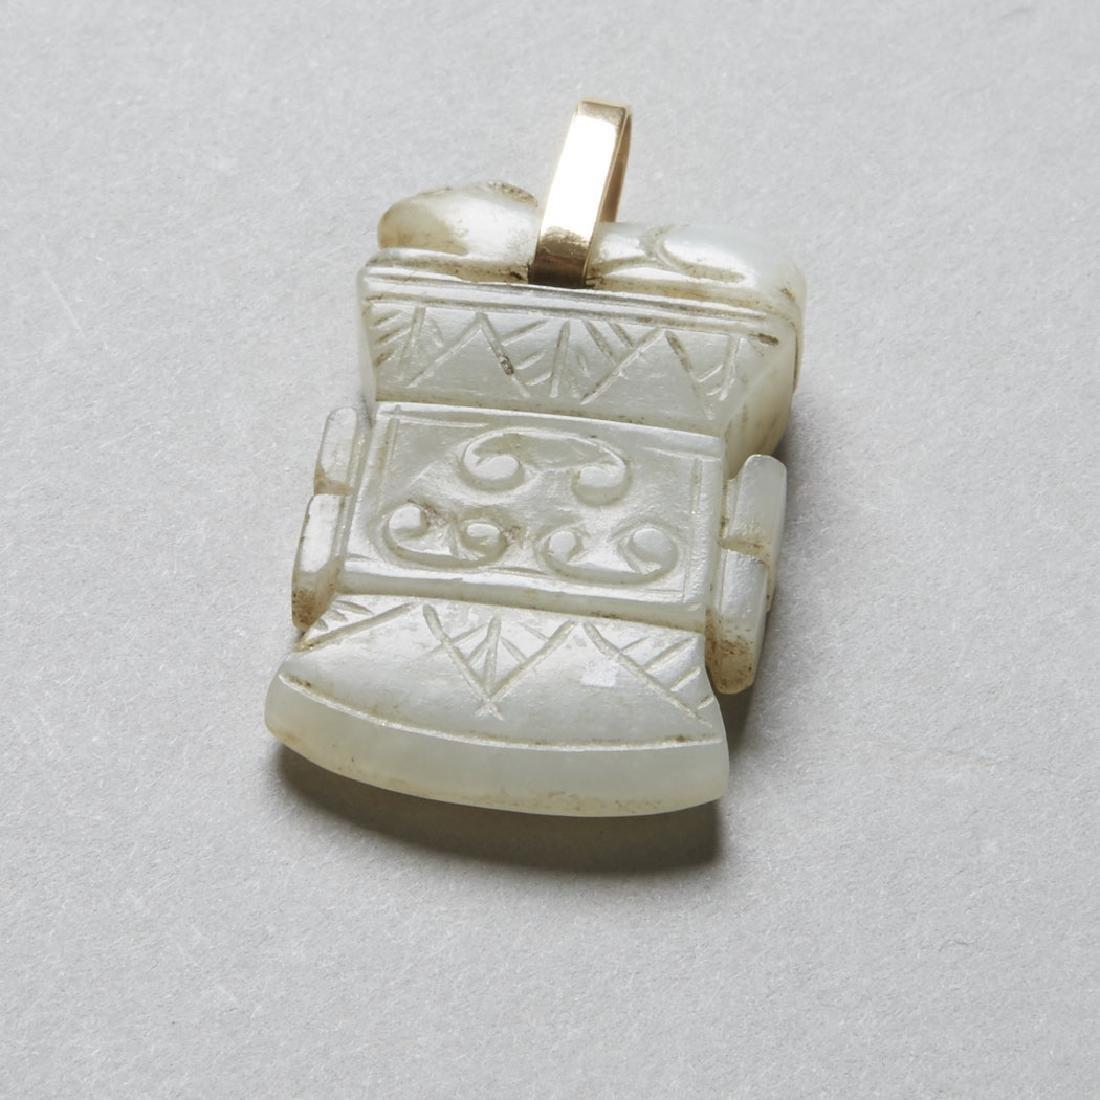 Chinese 19th Jade Pendant Archaic Axe Head - BTC Acpt